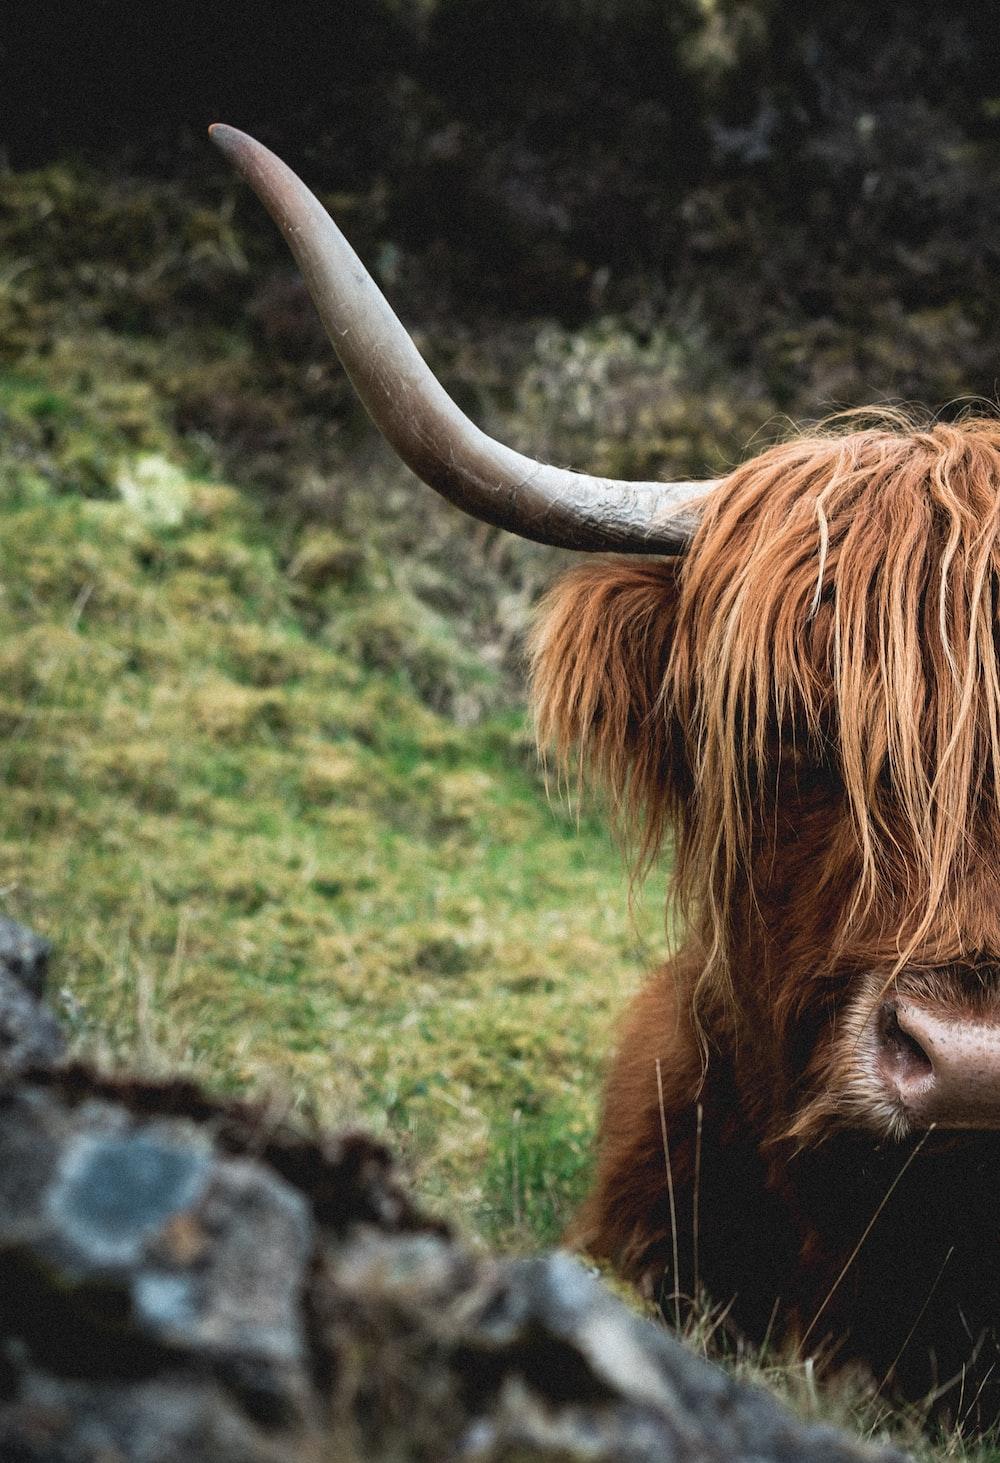 brown bull on grass field